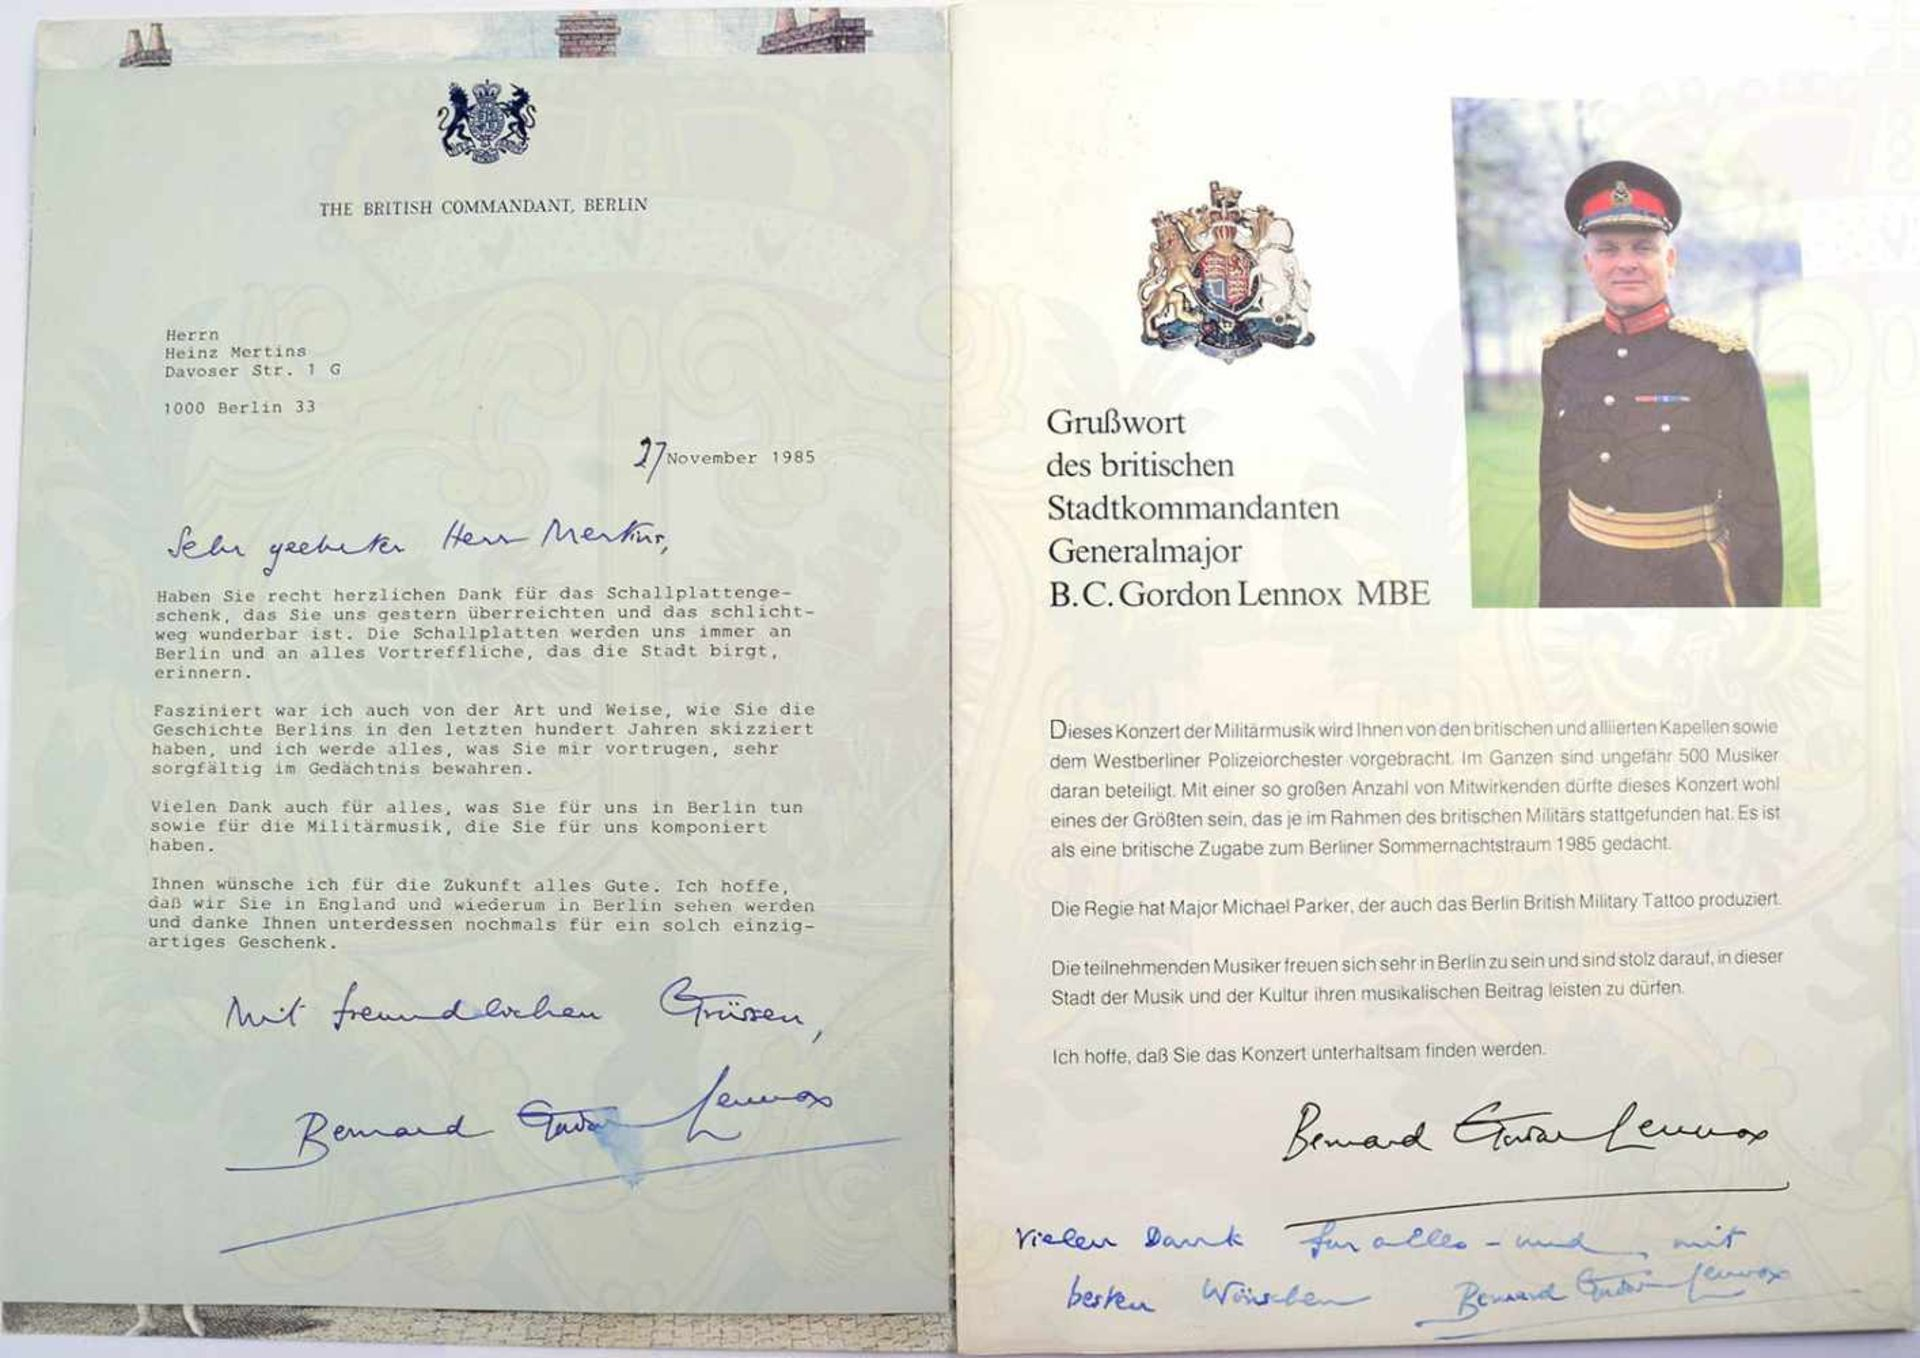 Los 30 - GORDON-LENNOX, BERNARD C., (1932-2017), brit. Generalmajor, Okt. 83-Dez. 85 Kdt. d. brit. Sektors in